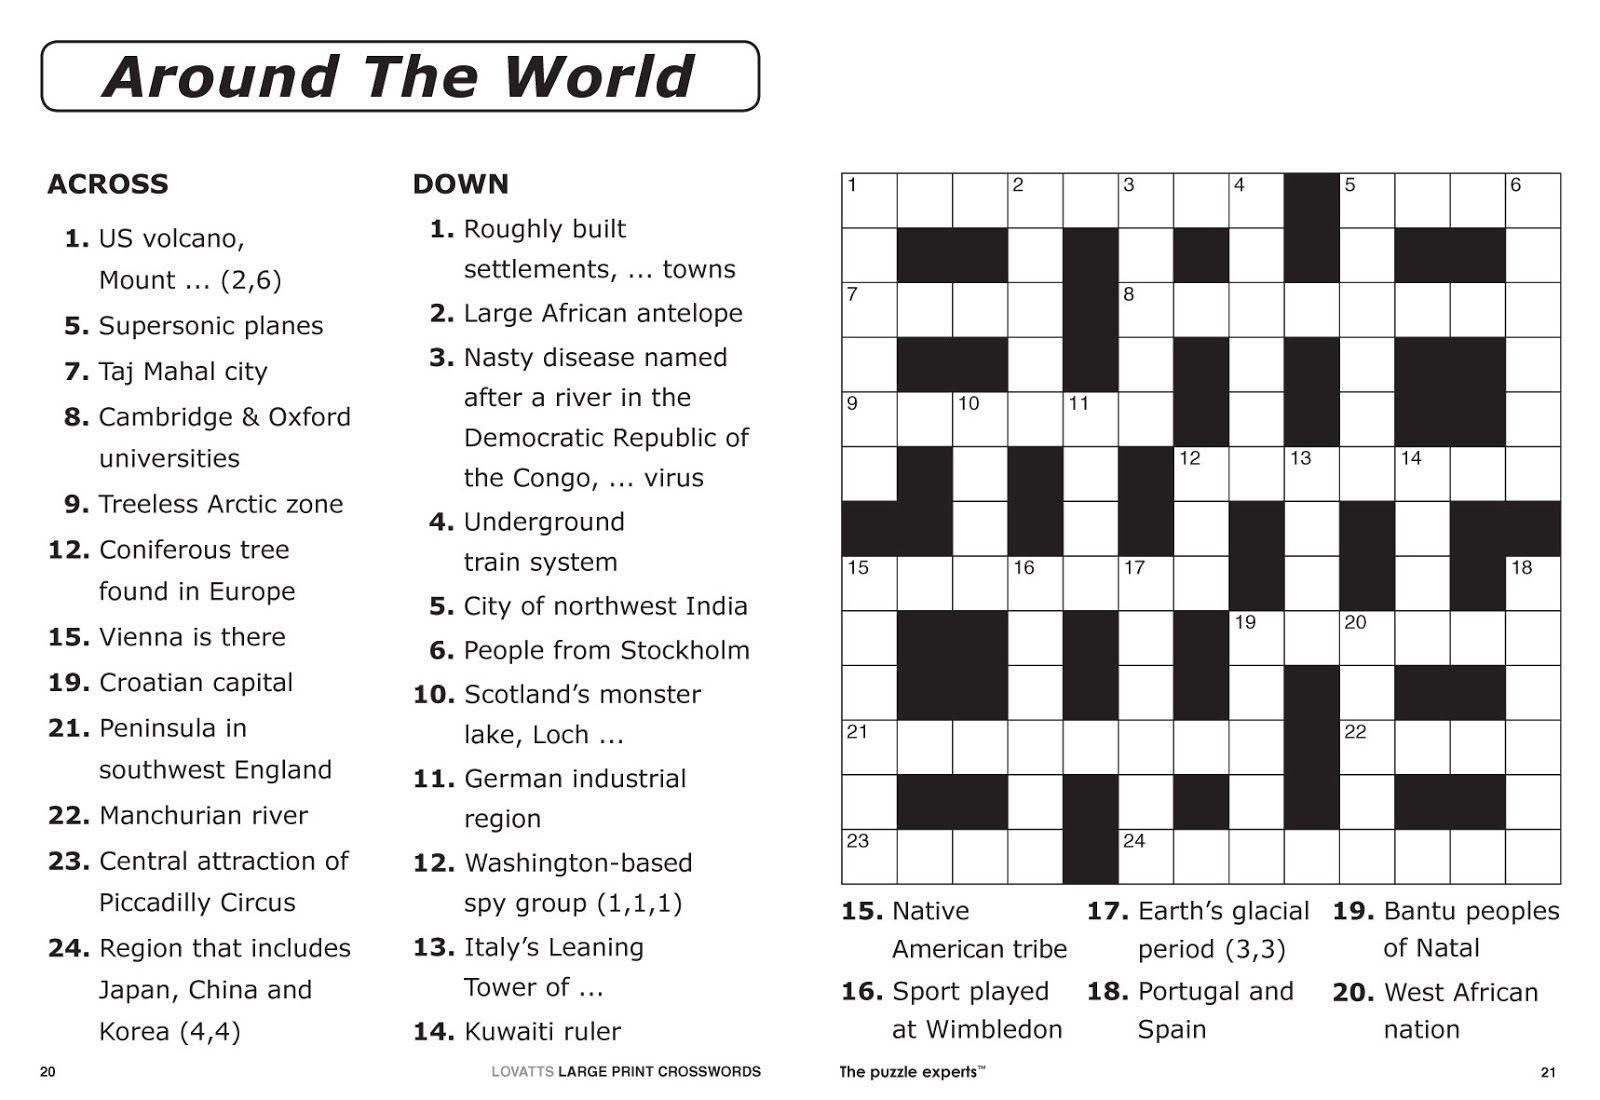 Free Printable Large Print Crossword Puzzles | M3U8 - Printable Crossword Puzzles No Download